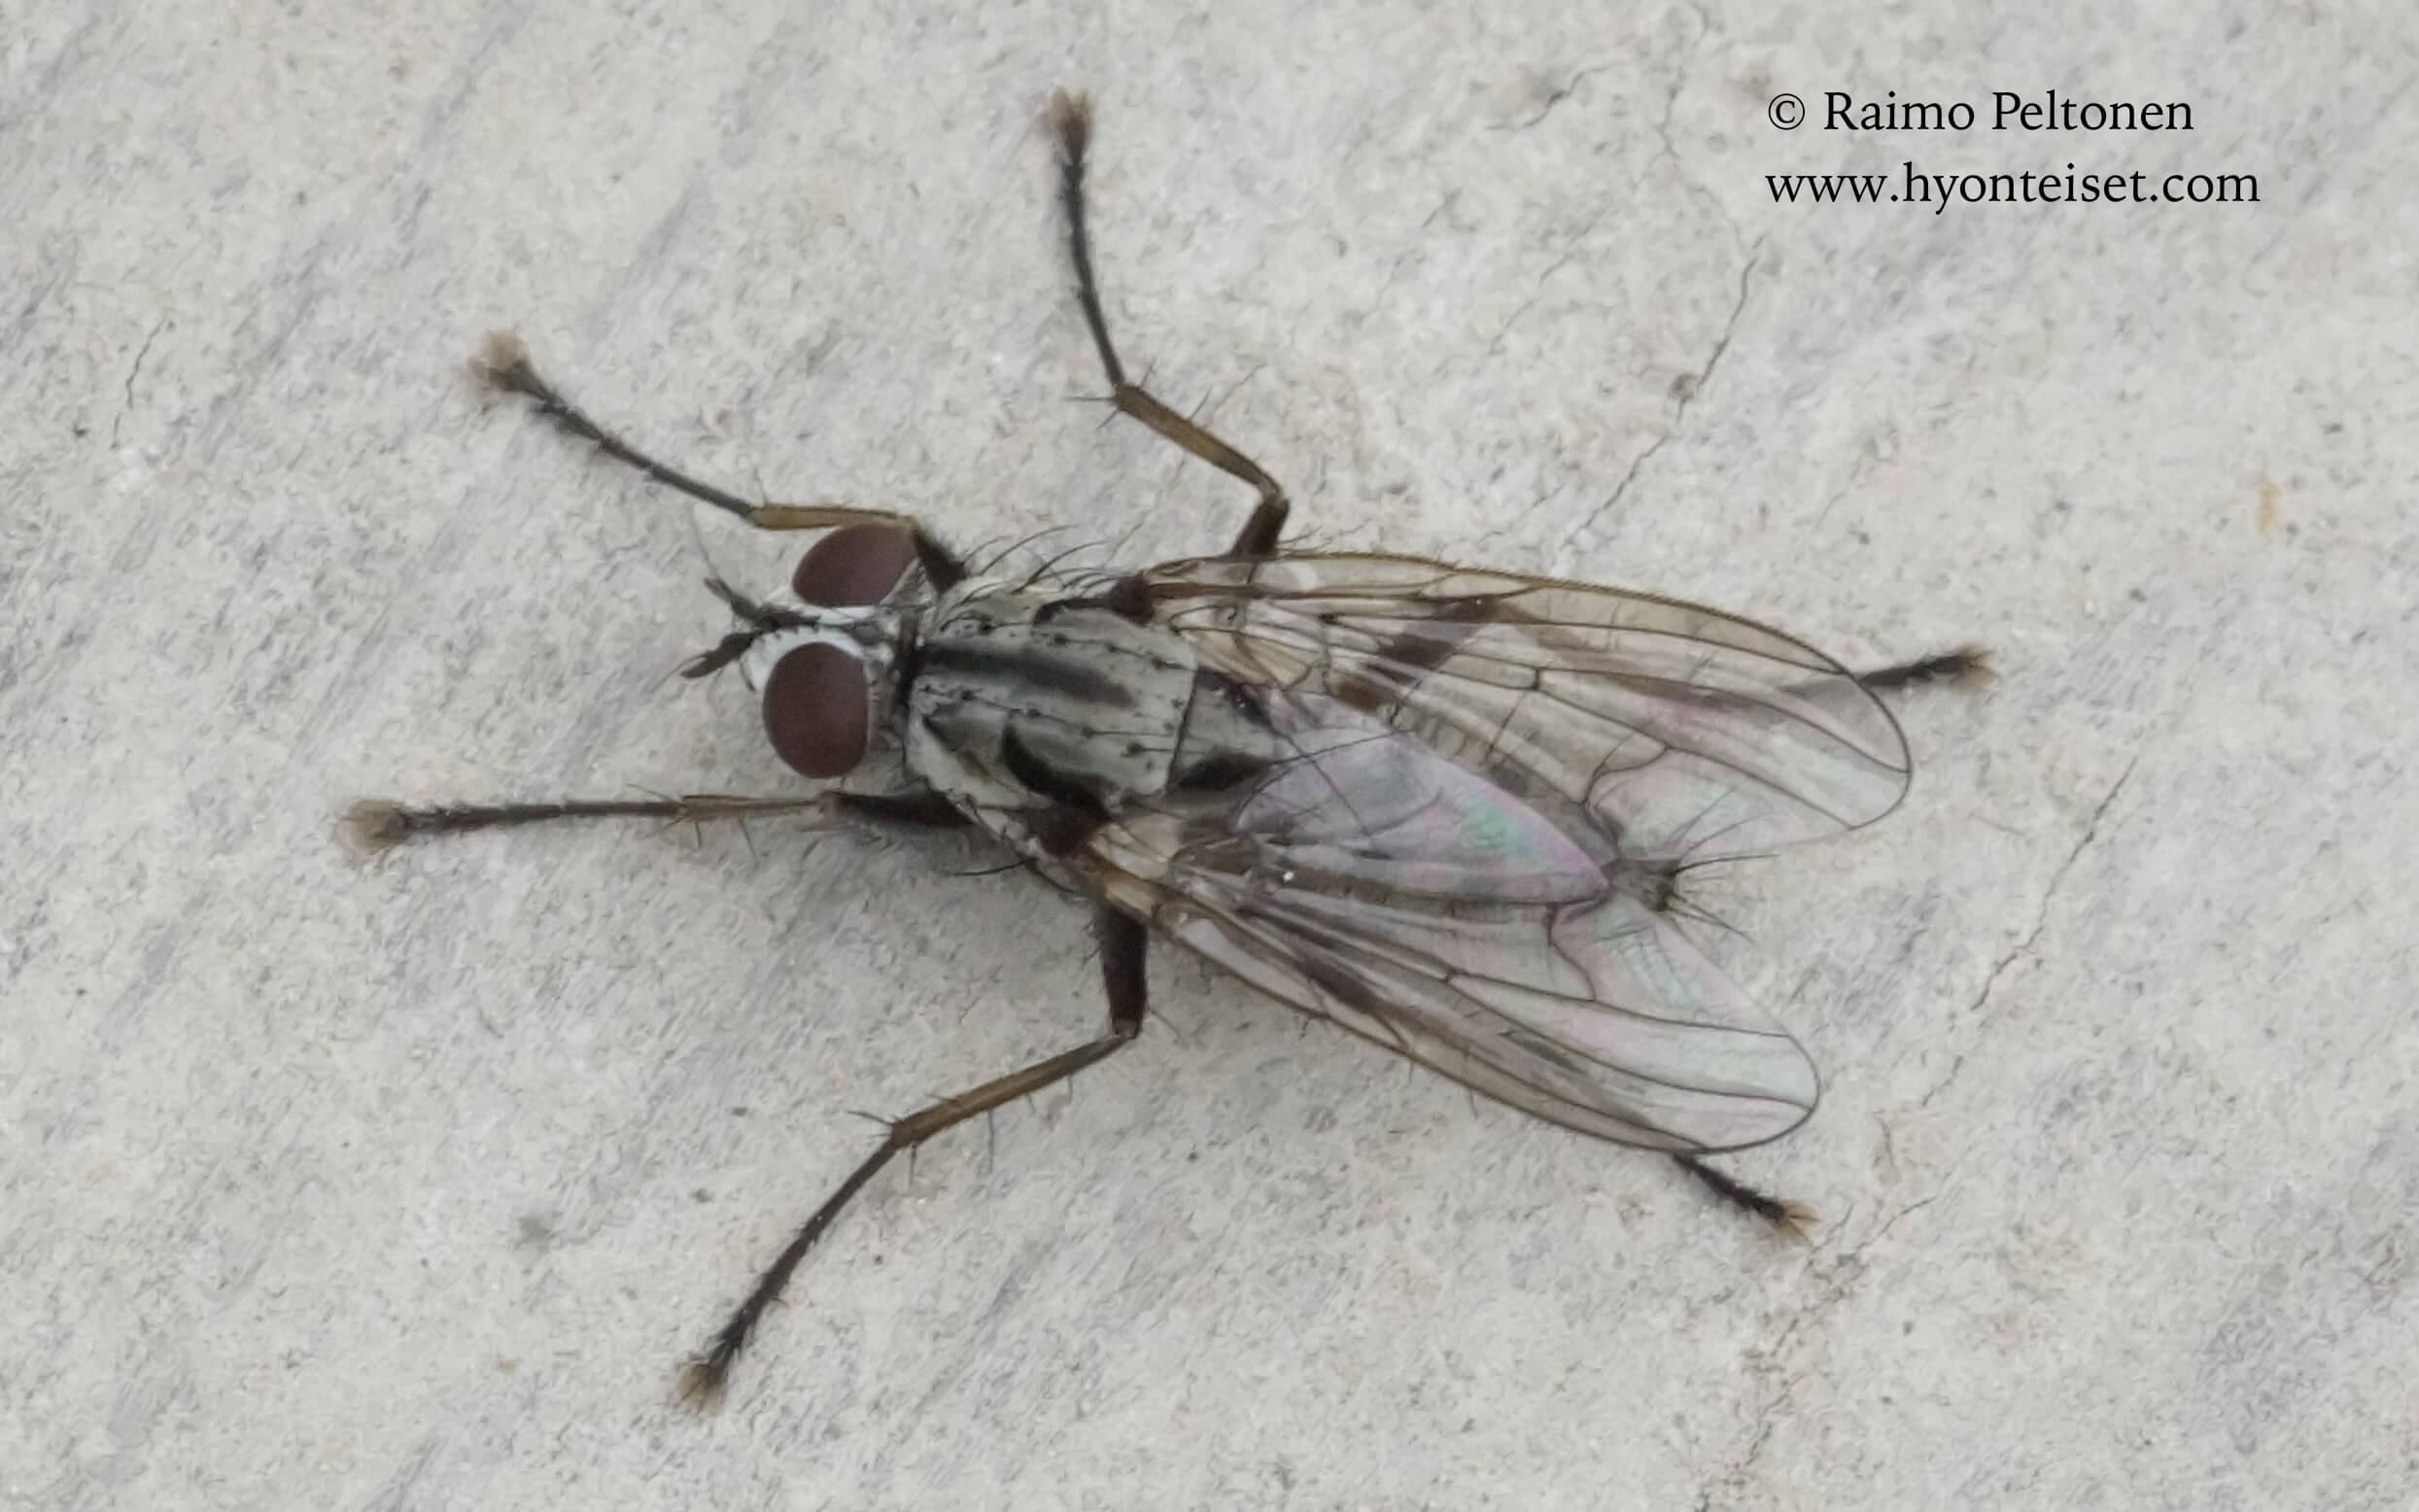 Eustalomyia vittipes (det. John Carr), 12.6.2017 Jyväskylä